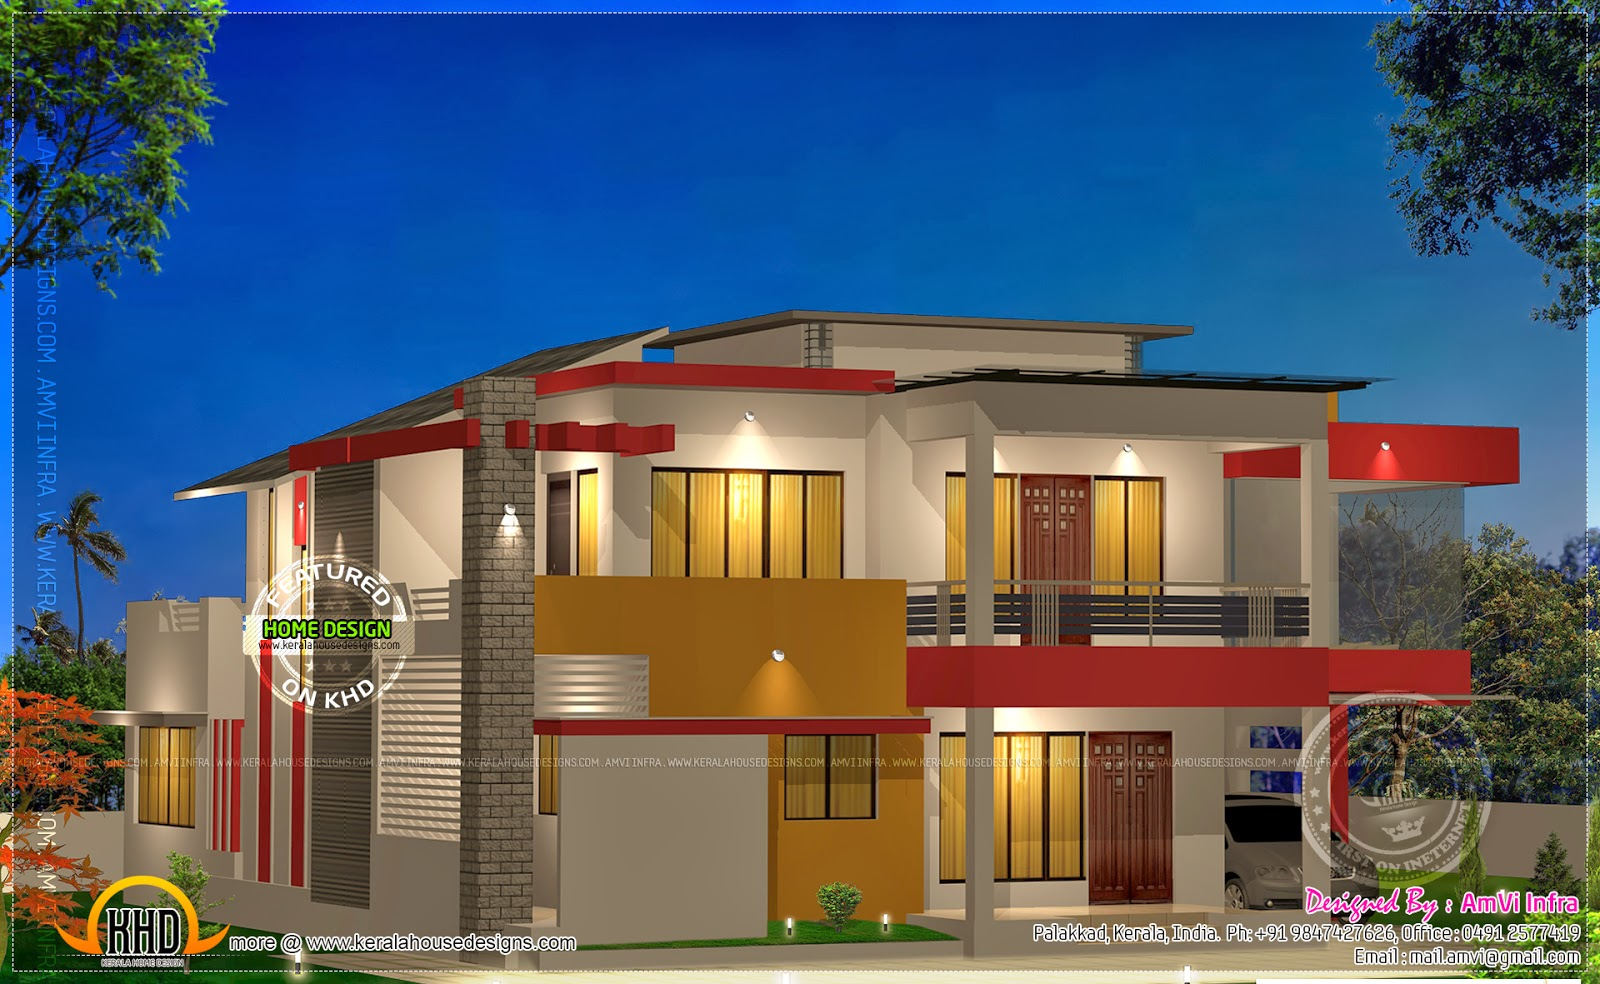 √ Modern 4 BHK house plan in 2800 sq.feet on